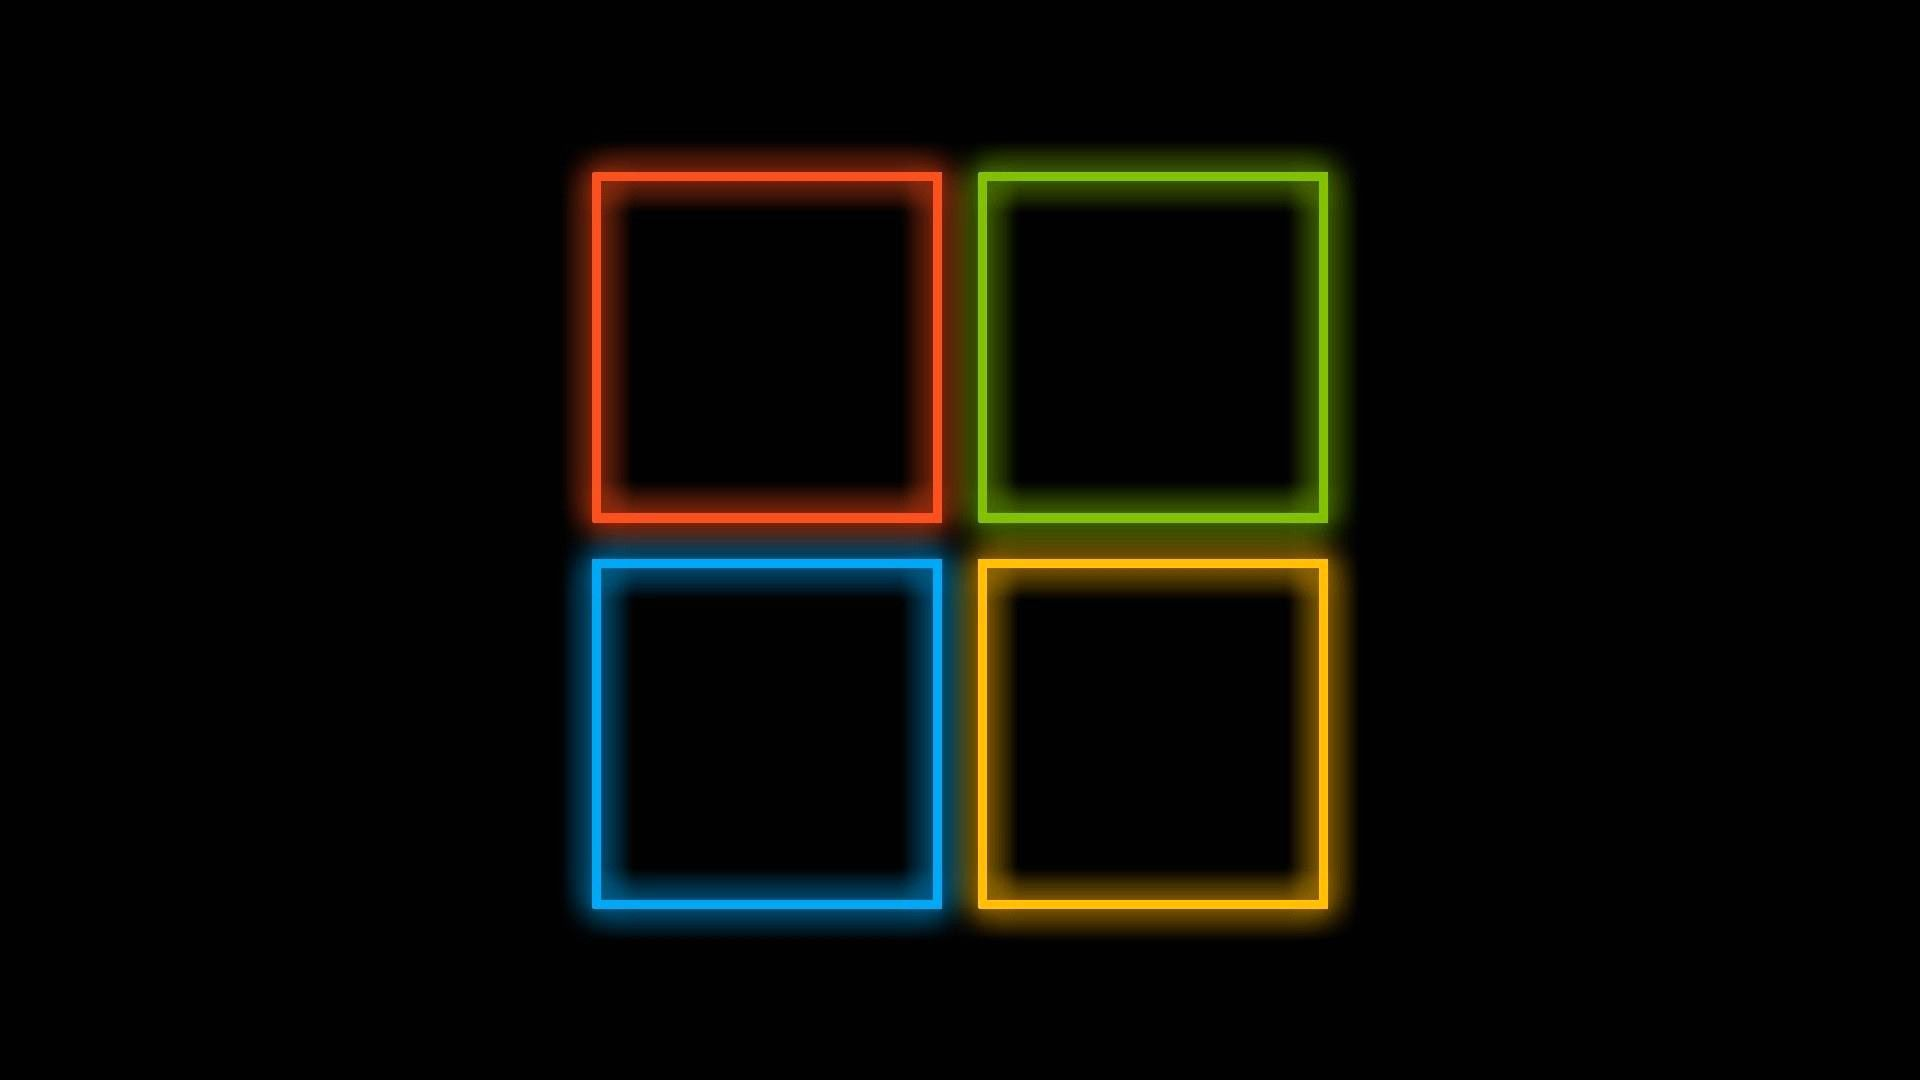 1920x1080 Hd Windows Wallpapers P Windows Wallpaper Microsoft Wallpaper Desktop Background Images